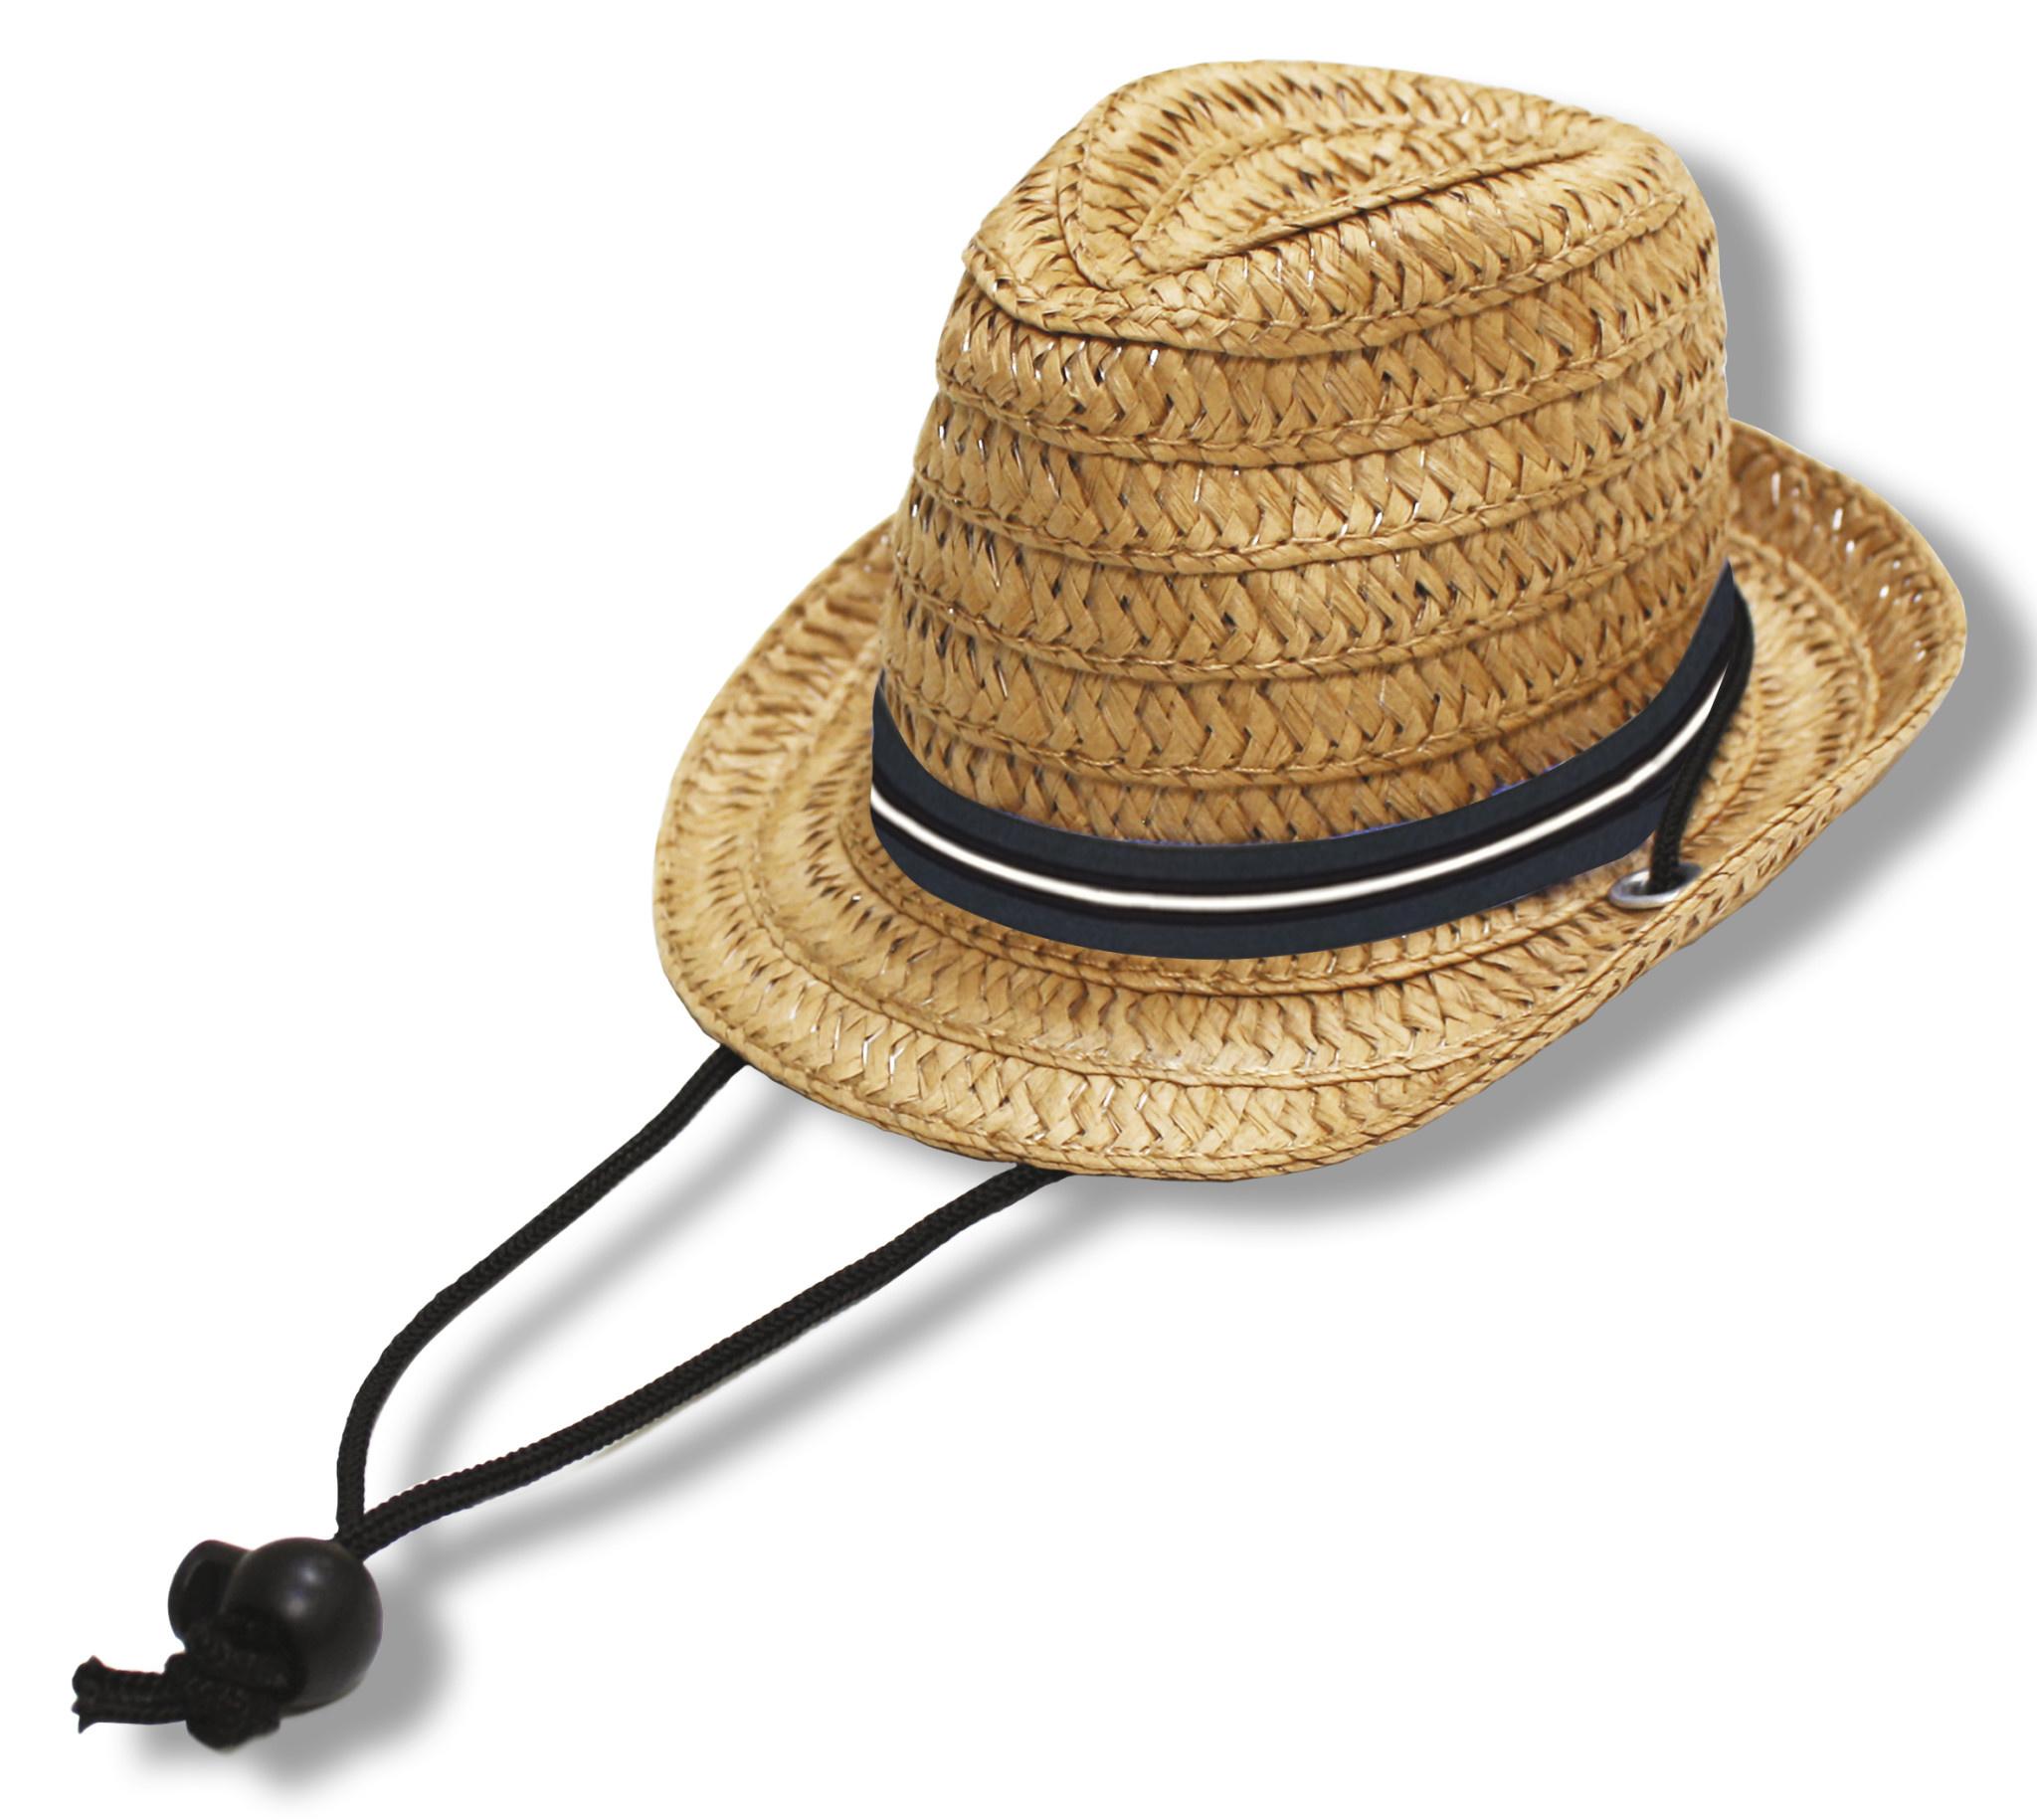 Croci stro hoed panama